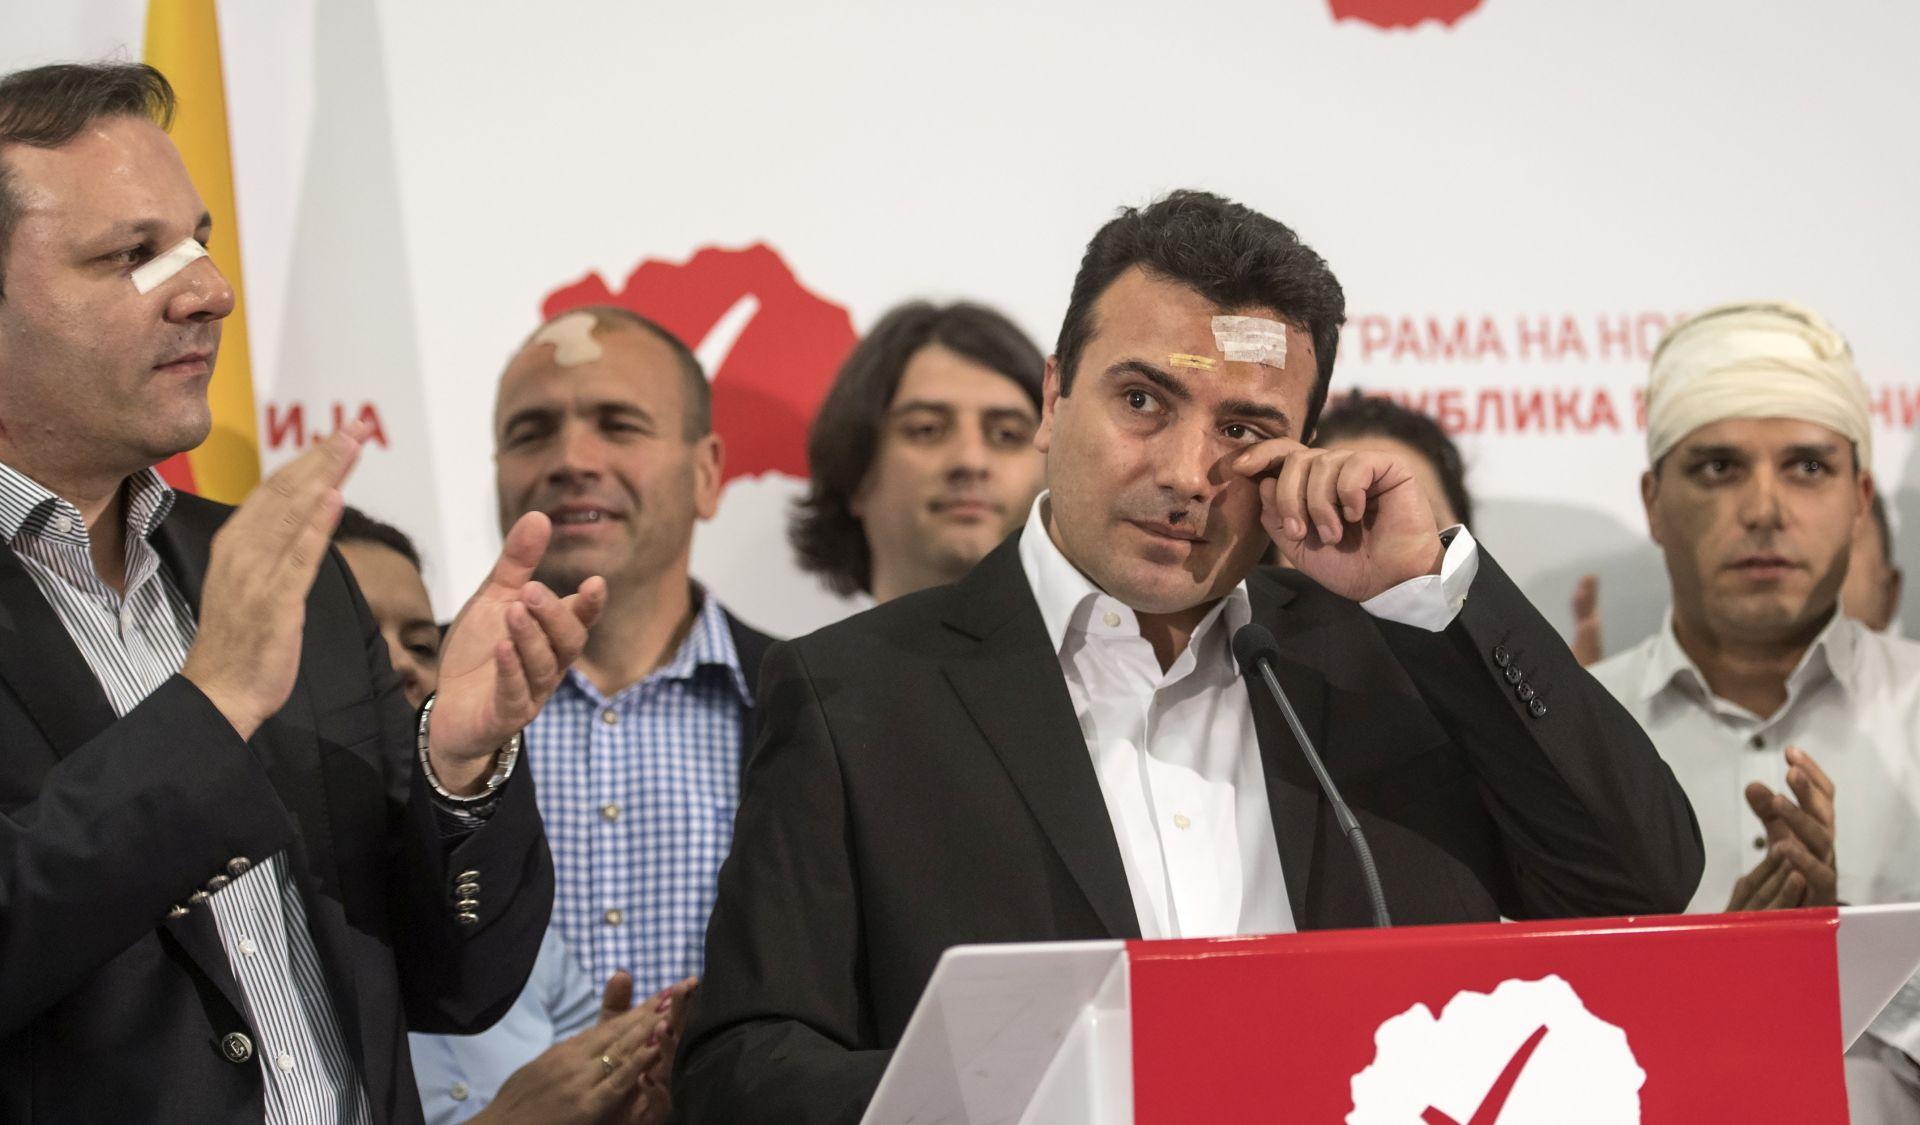 Makedonski parlament izglasao novu vladu